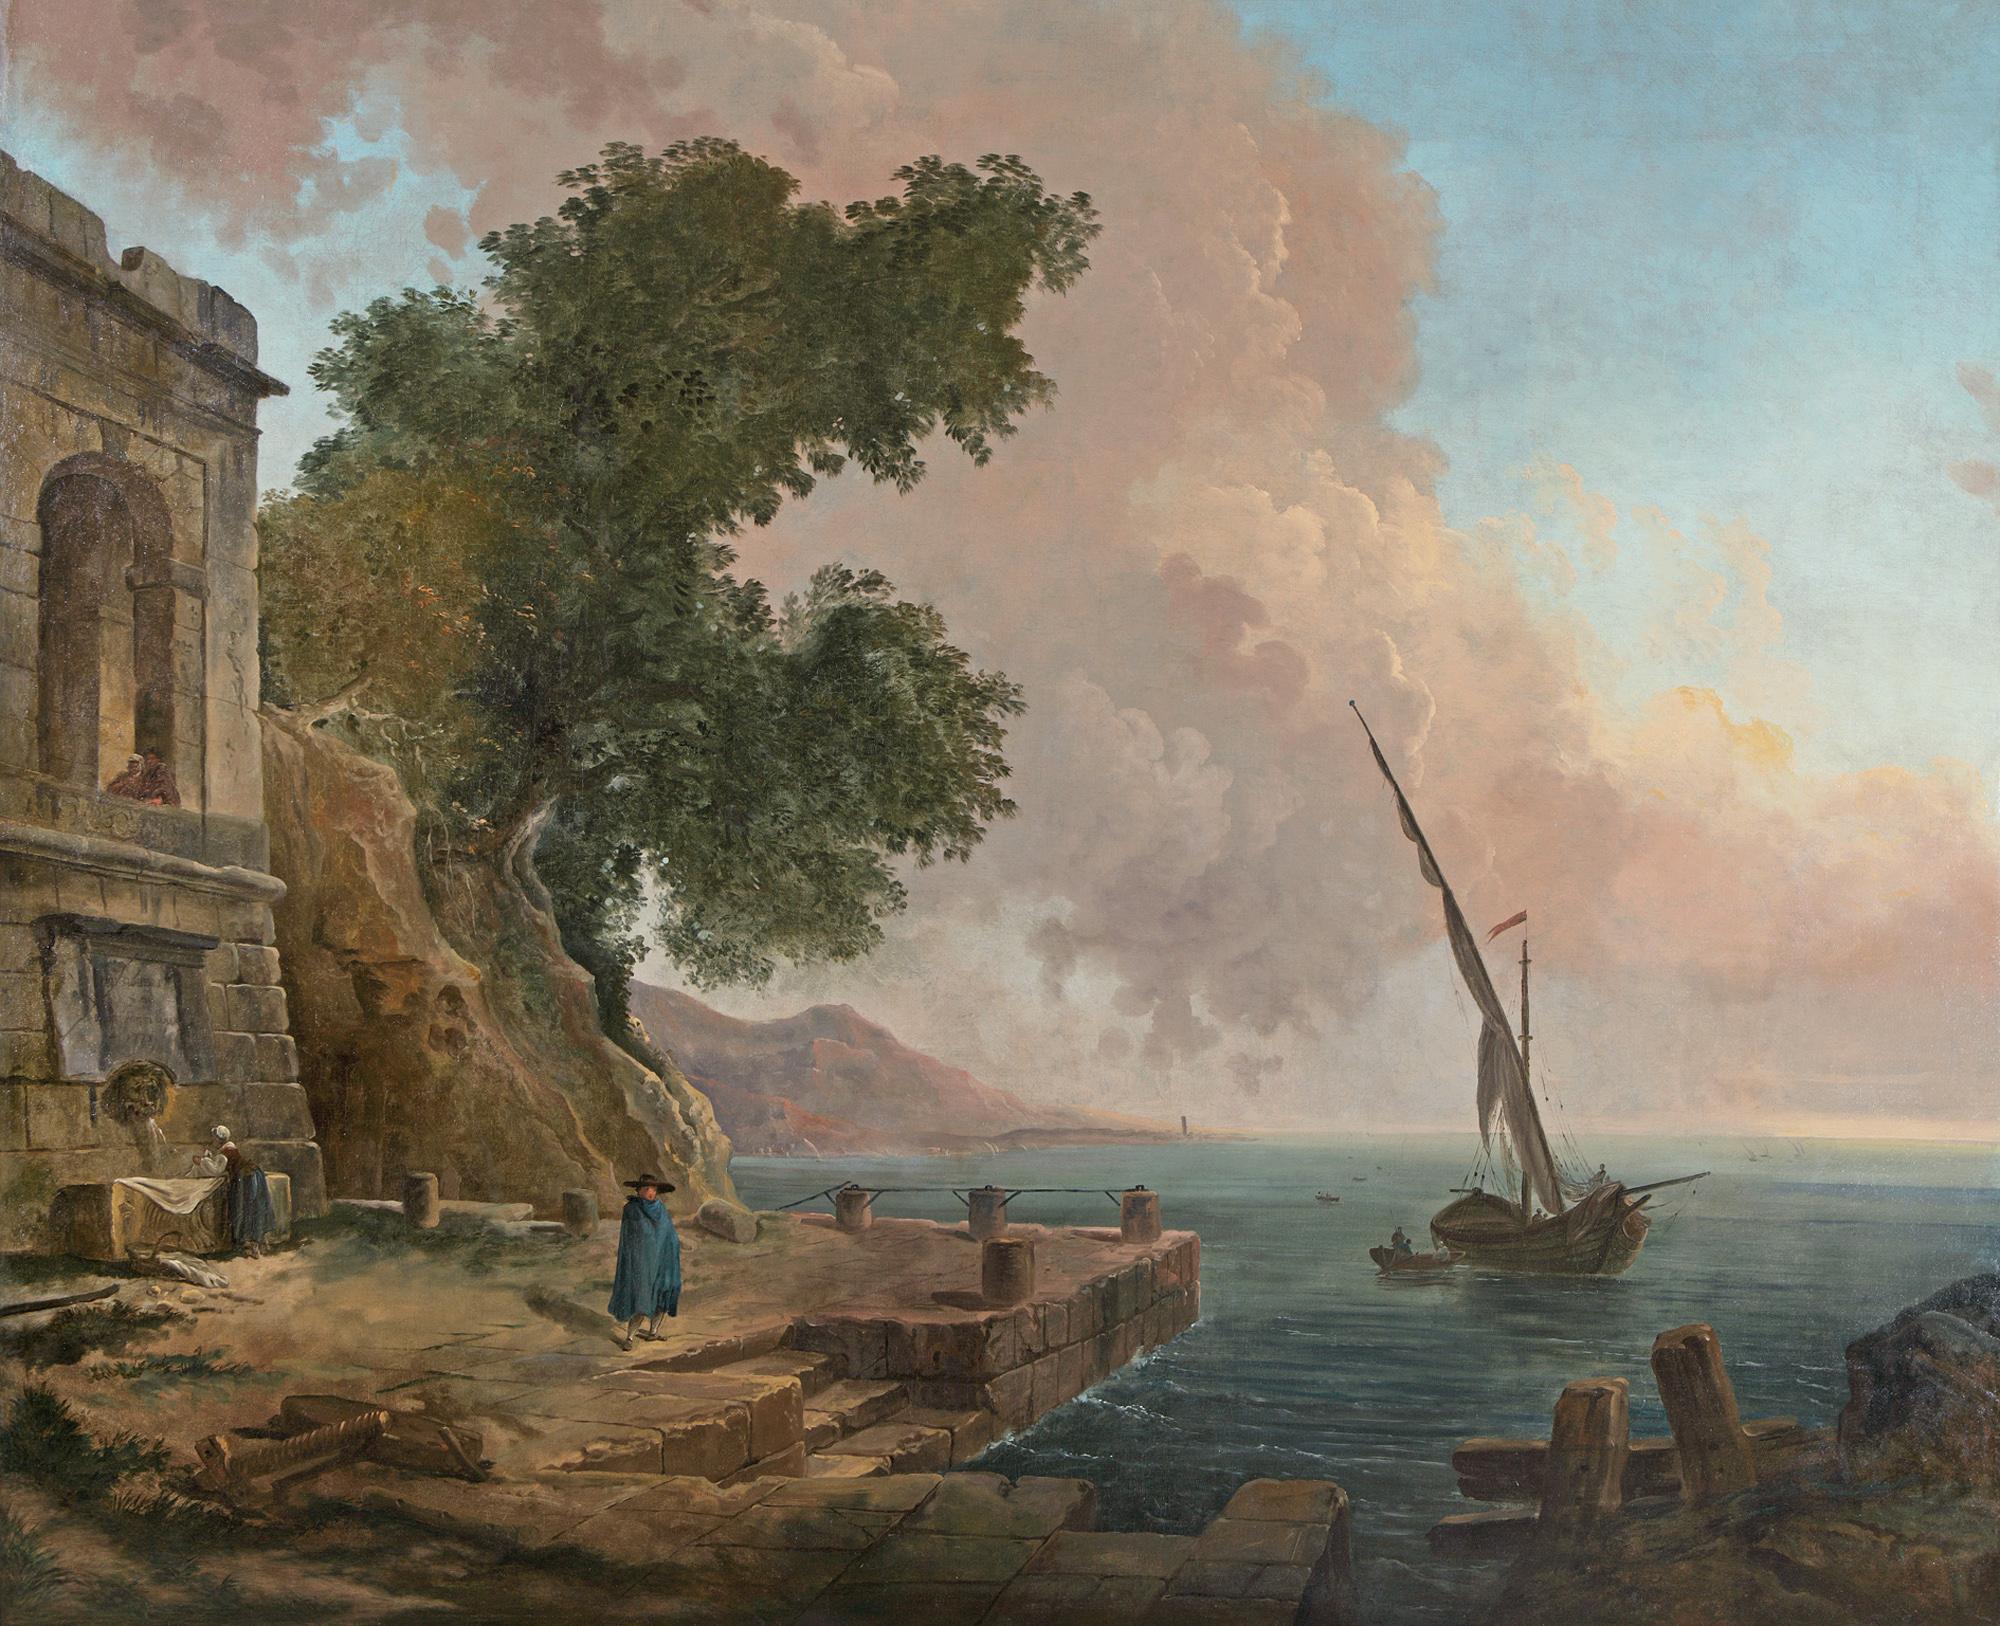 Hubert Robert - Embarcadère méditerranéen © Galerie Michel Descours